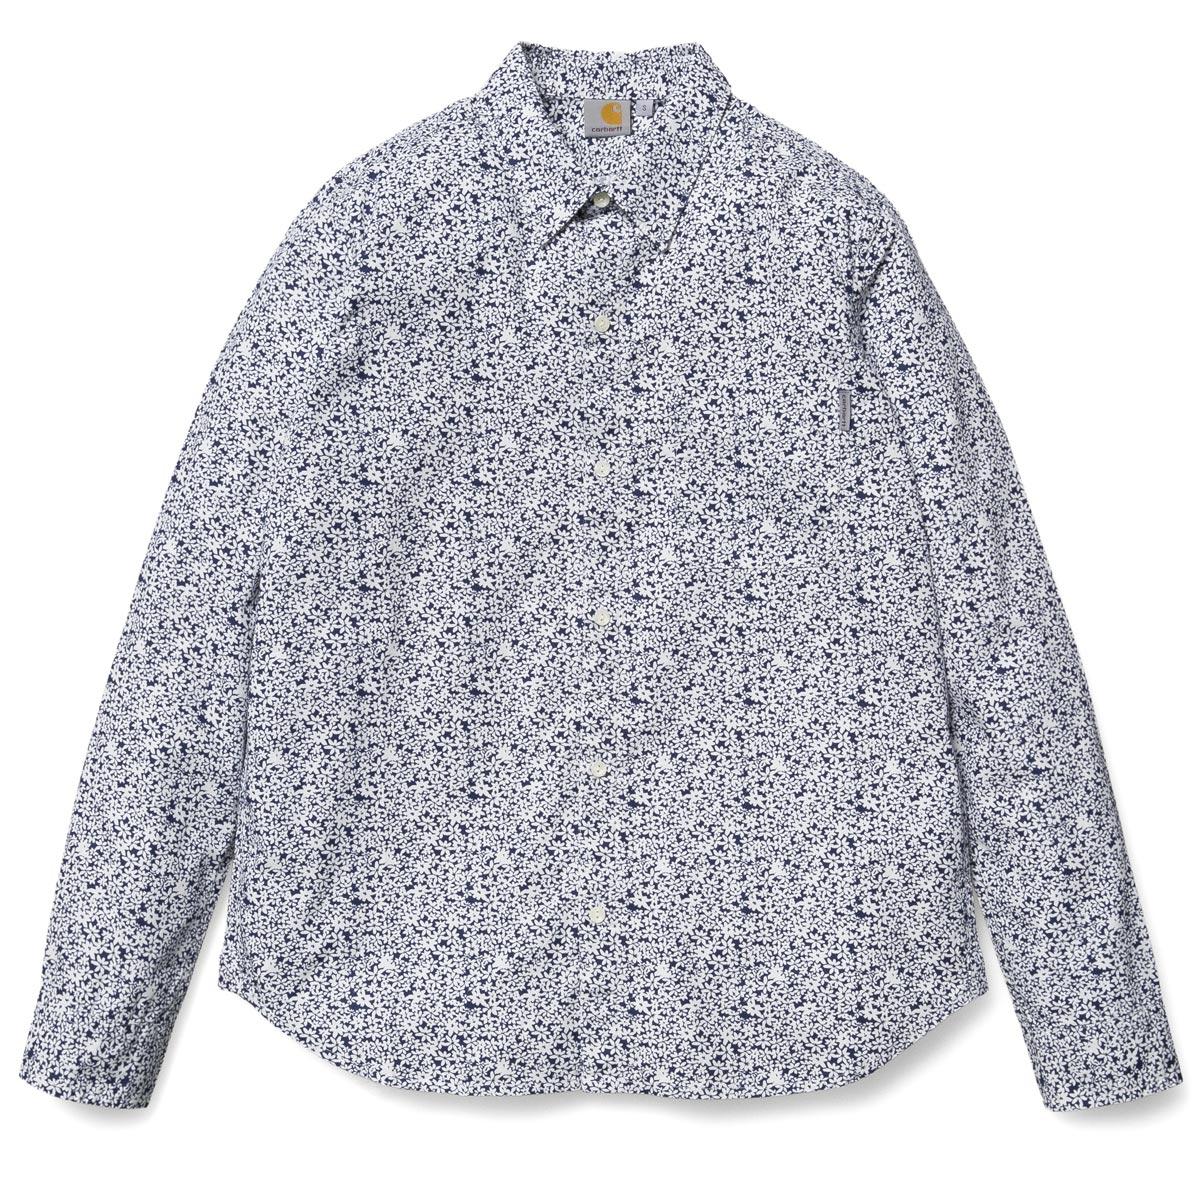 W' L/S Orchid Shirt